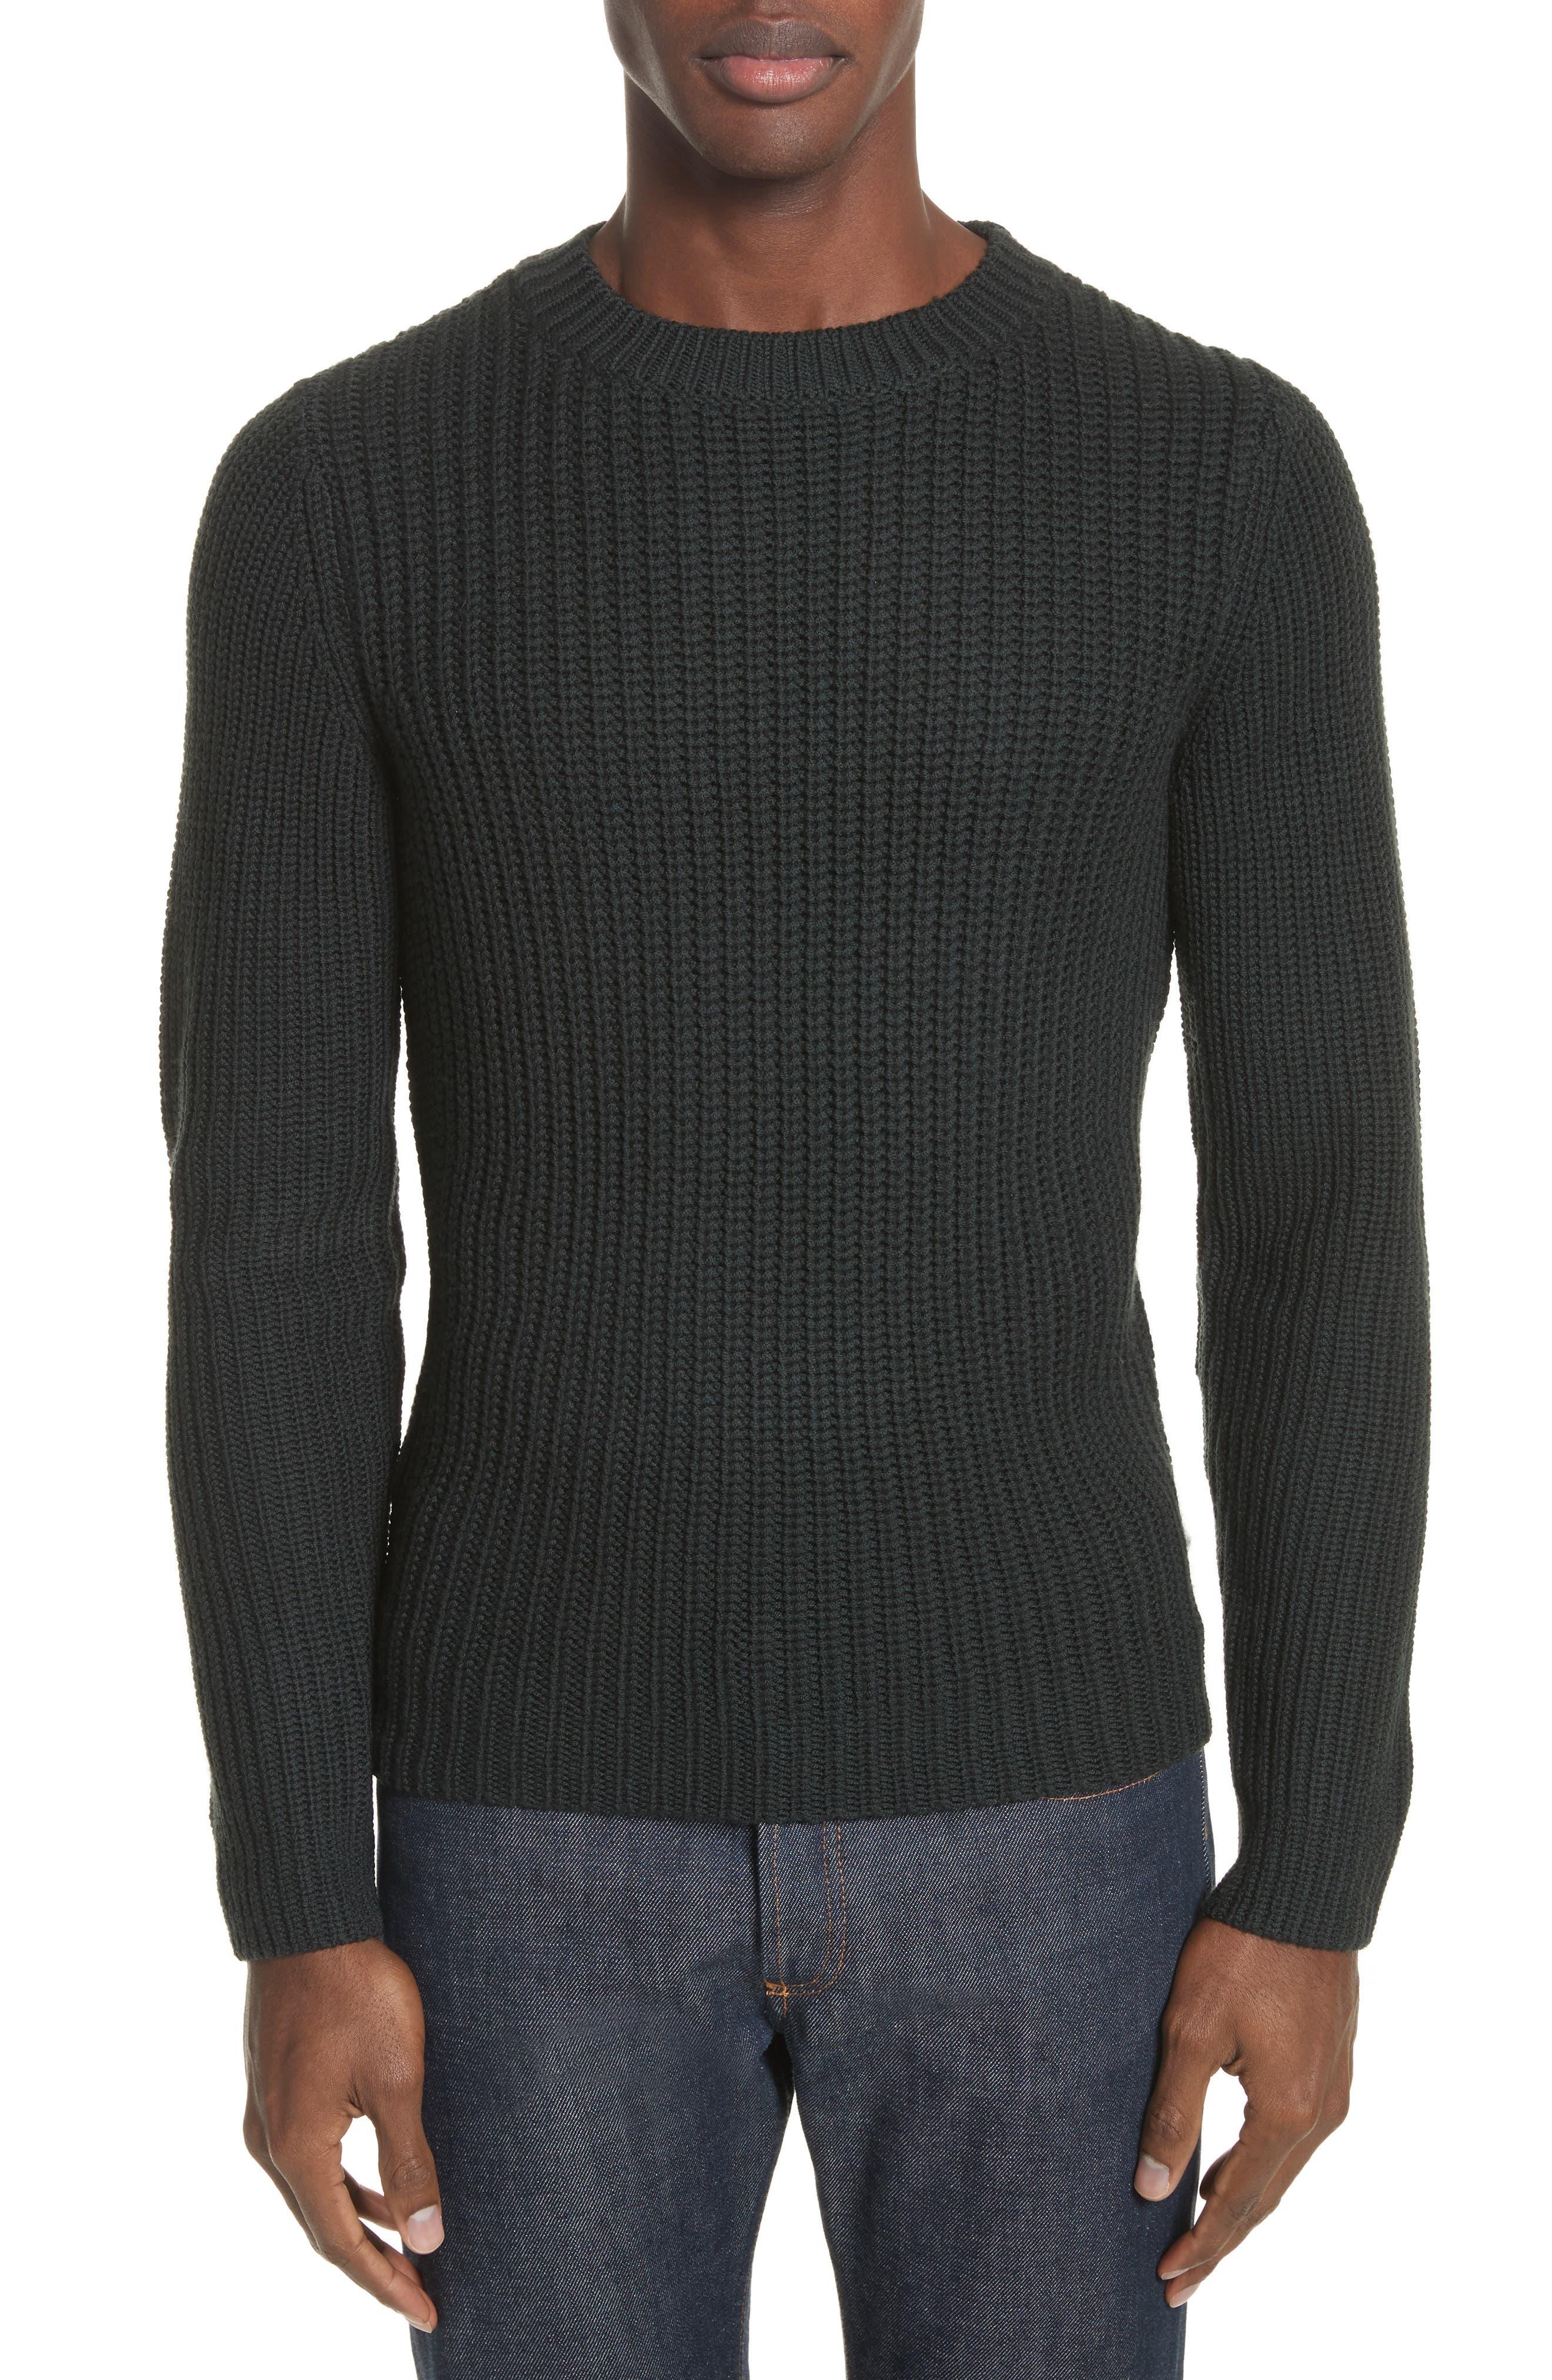 Pull Berger Merino Wool Sweater,                         Main,                         color, Khaki Green